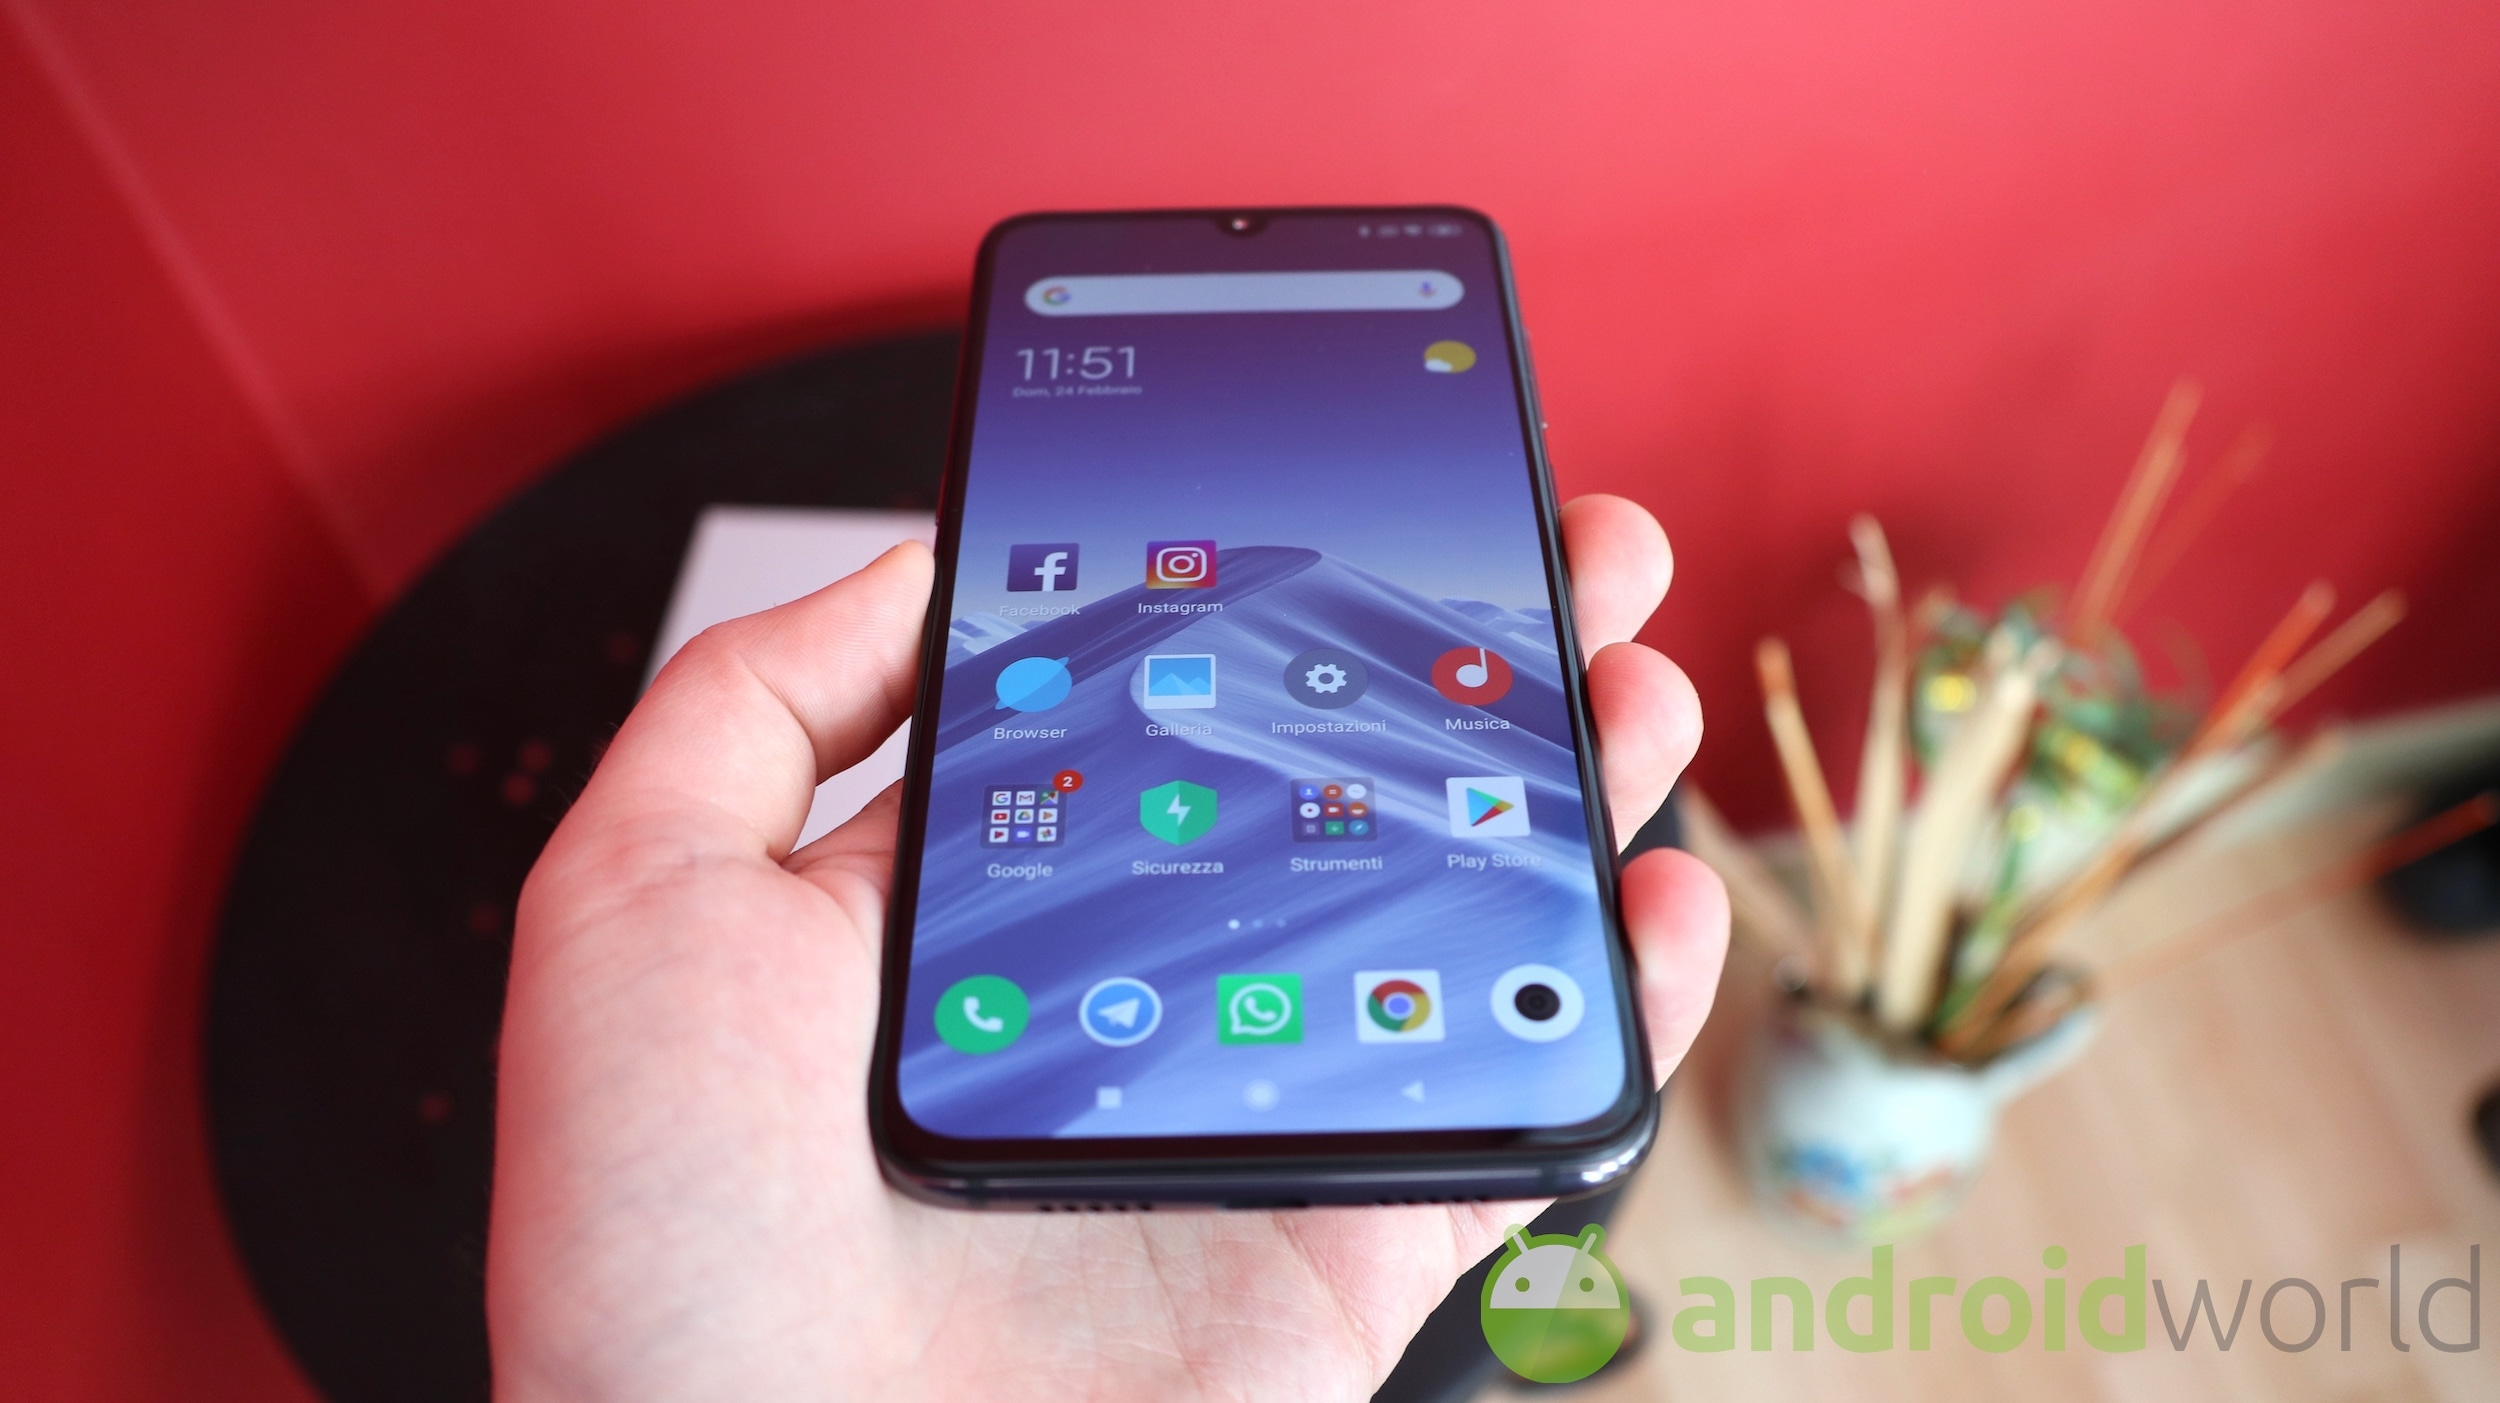 Benchmark Samsung Galaxy s10 + against Xiaomi Mi9: AnTuTu and Geekbench